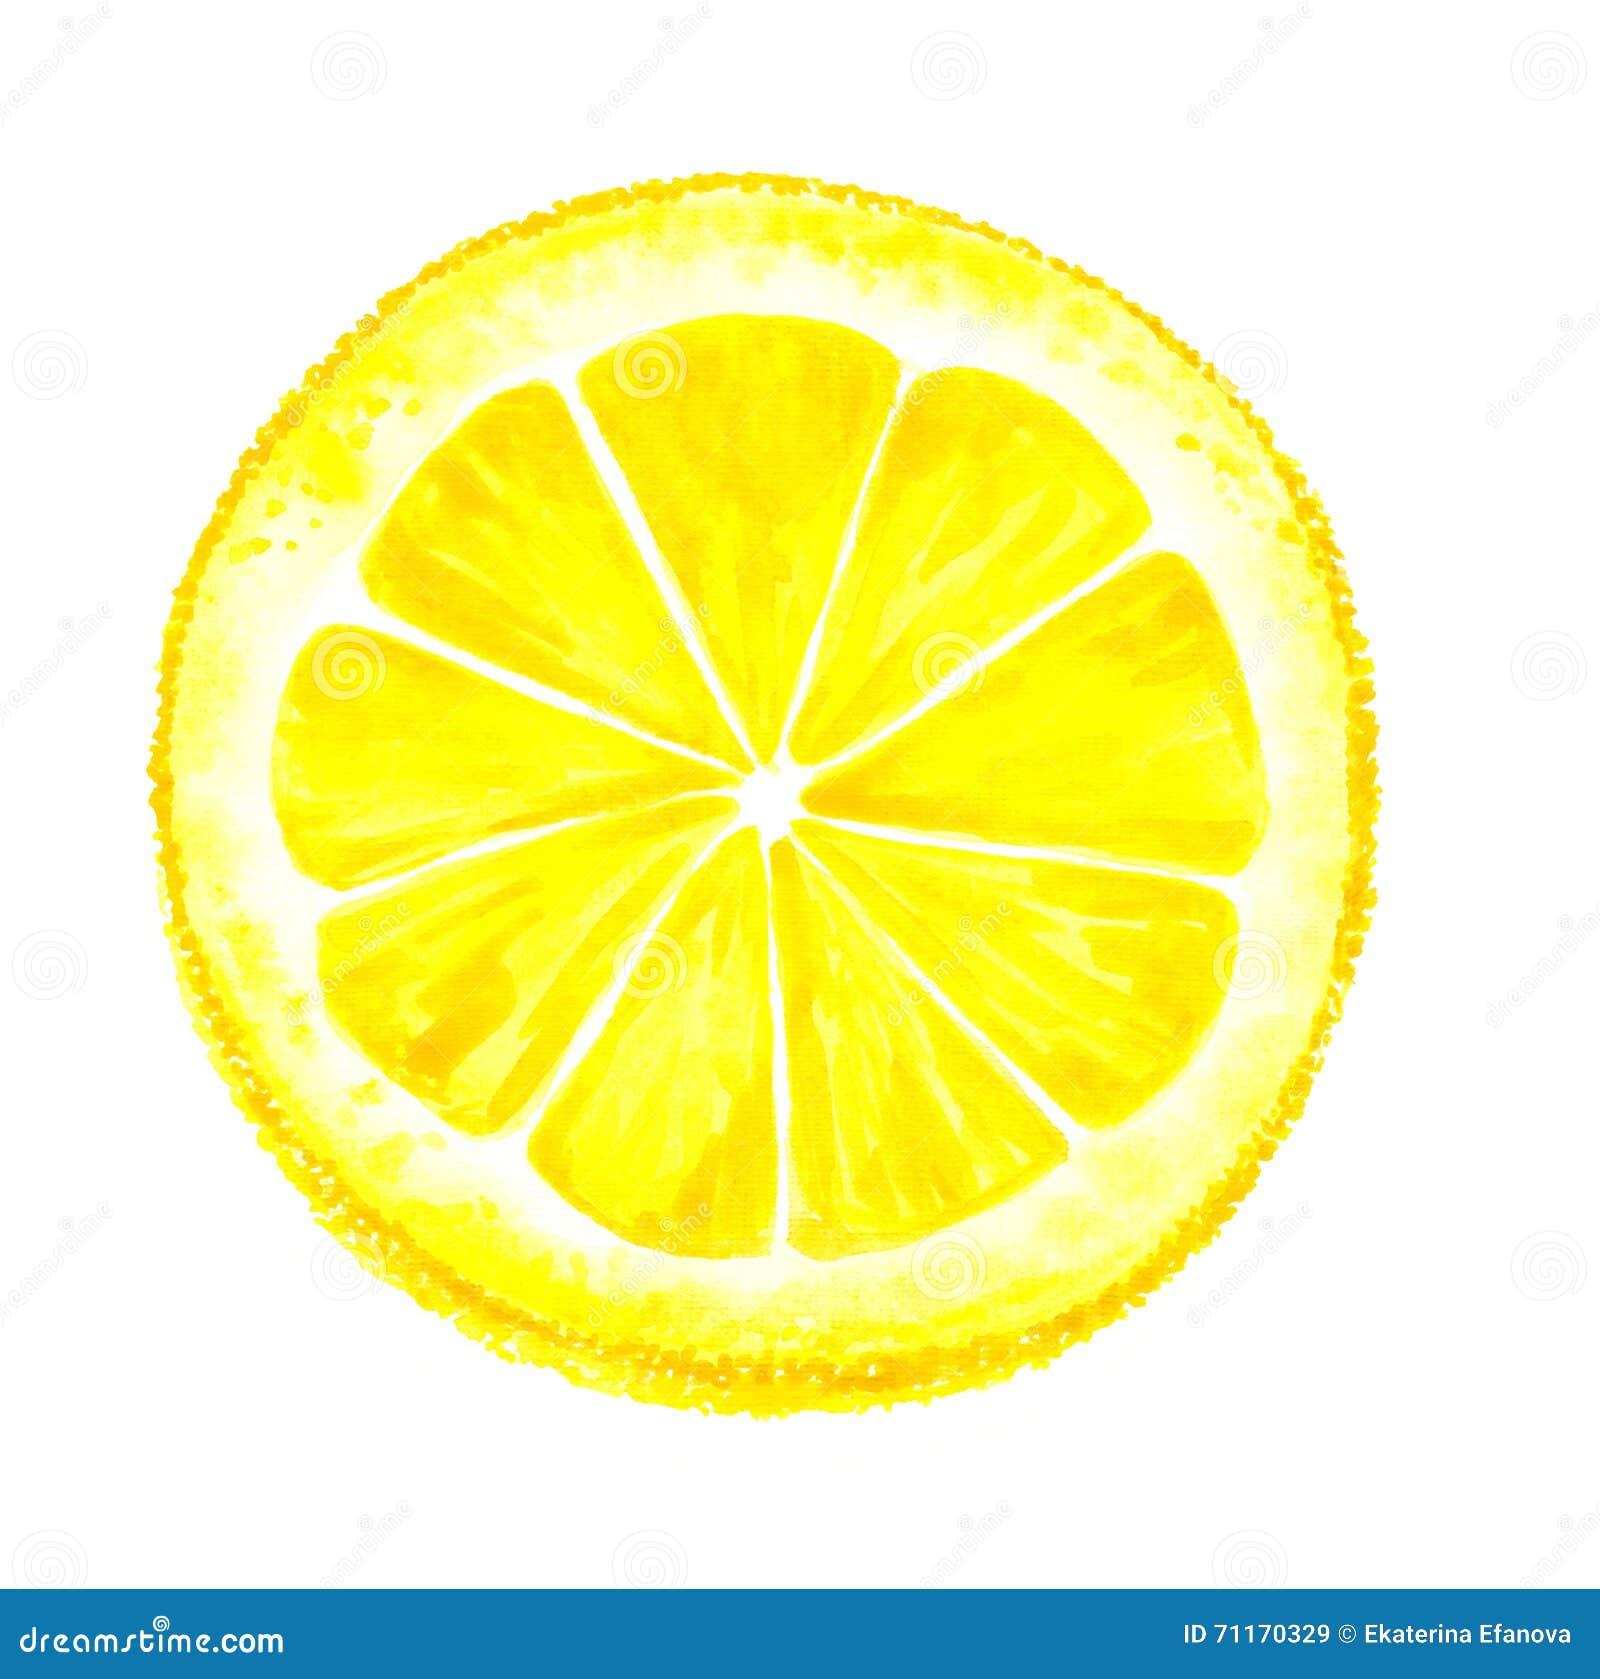 Watercolor Lemon Cut Royalty Free Stock Photo